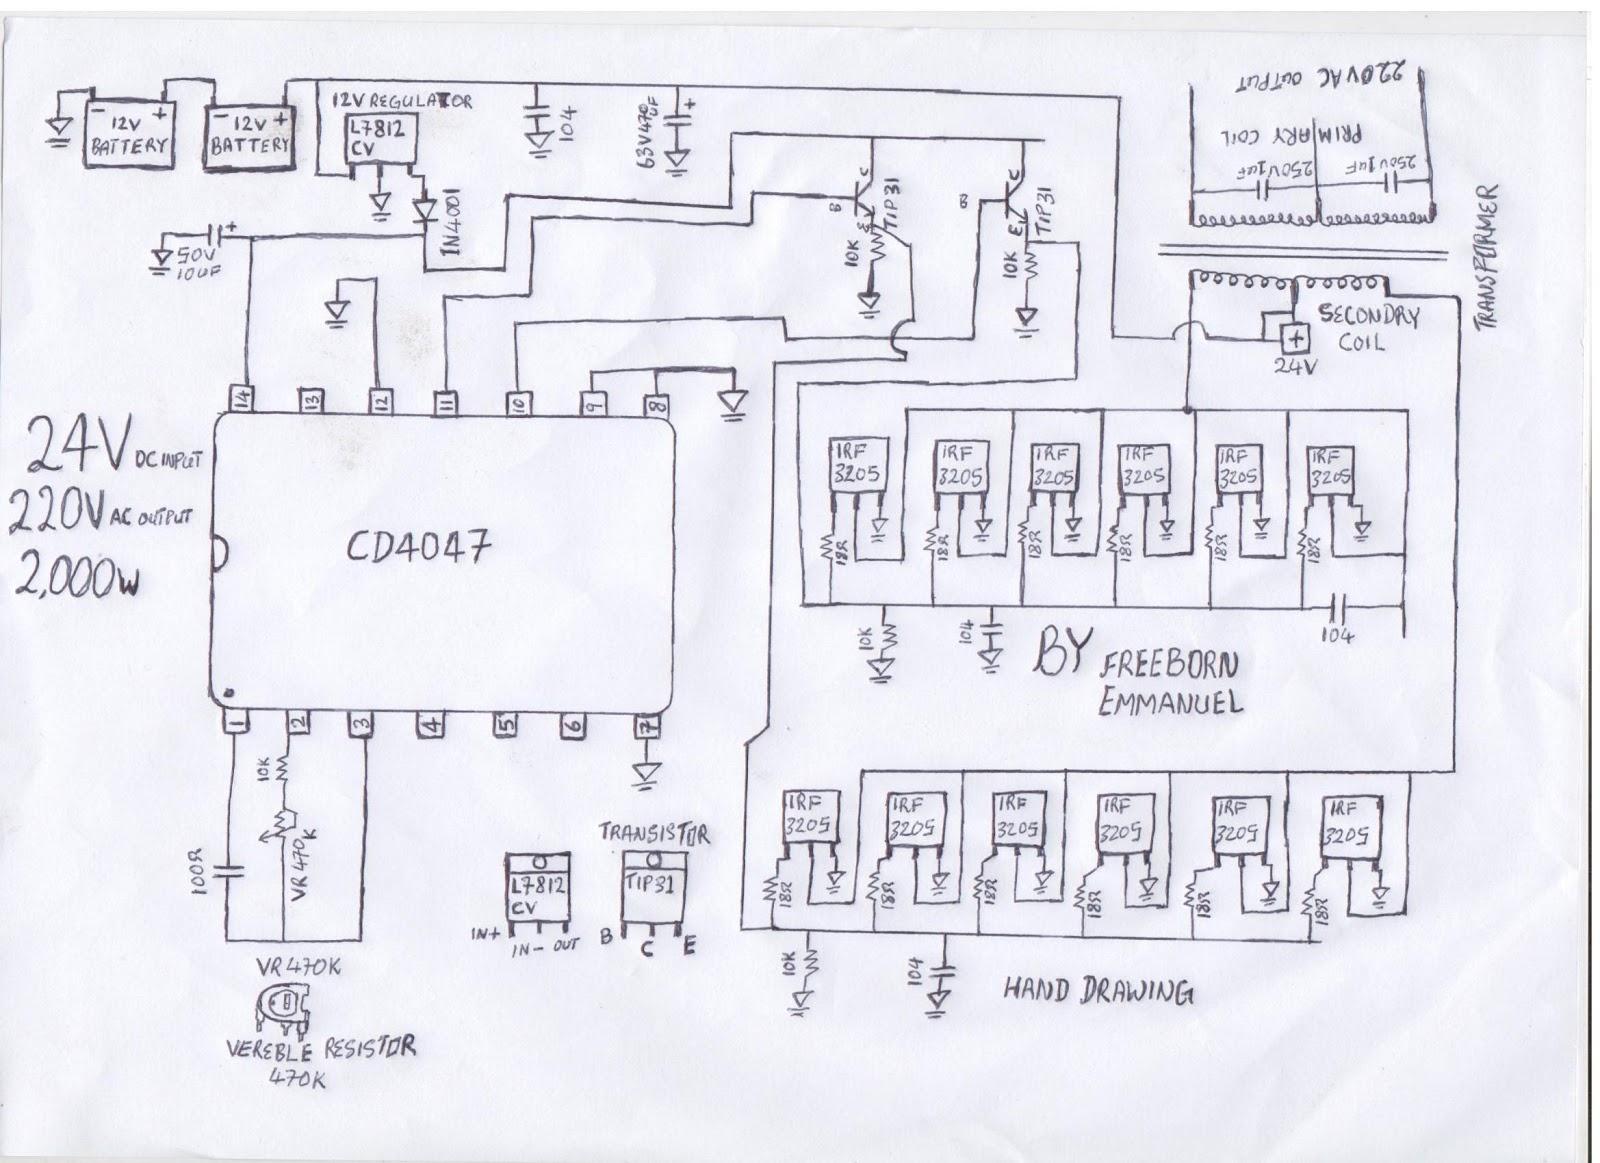 Circuit Diagram Of A 2kva Inverter Index 104 Power Supply Seekiccom How To Build 2000 Watt